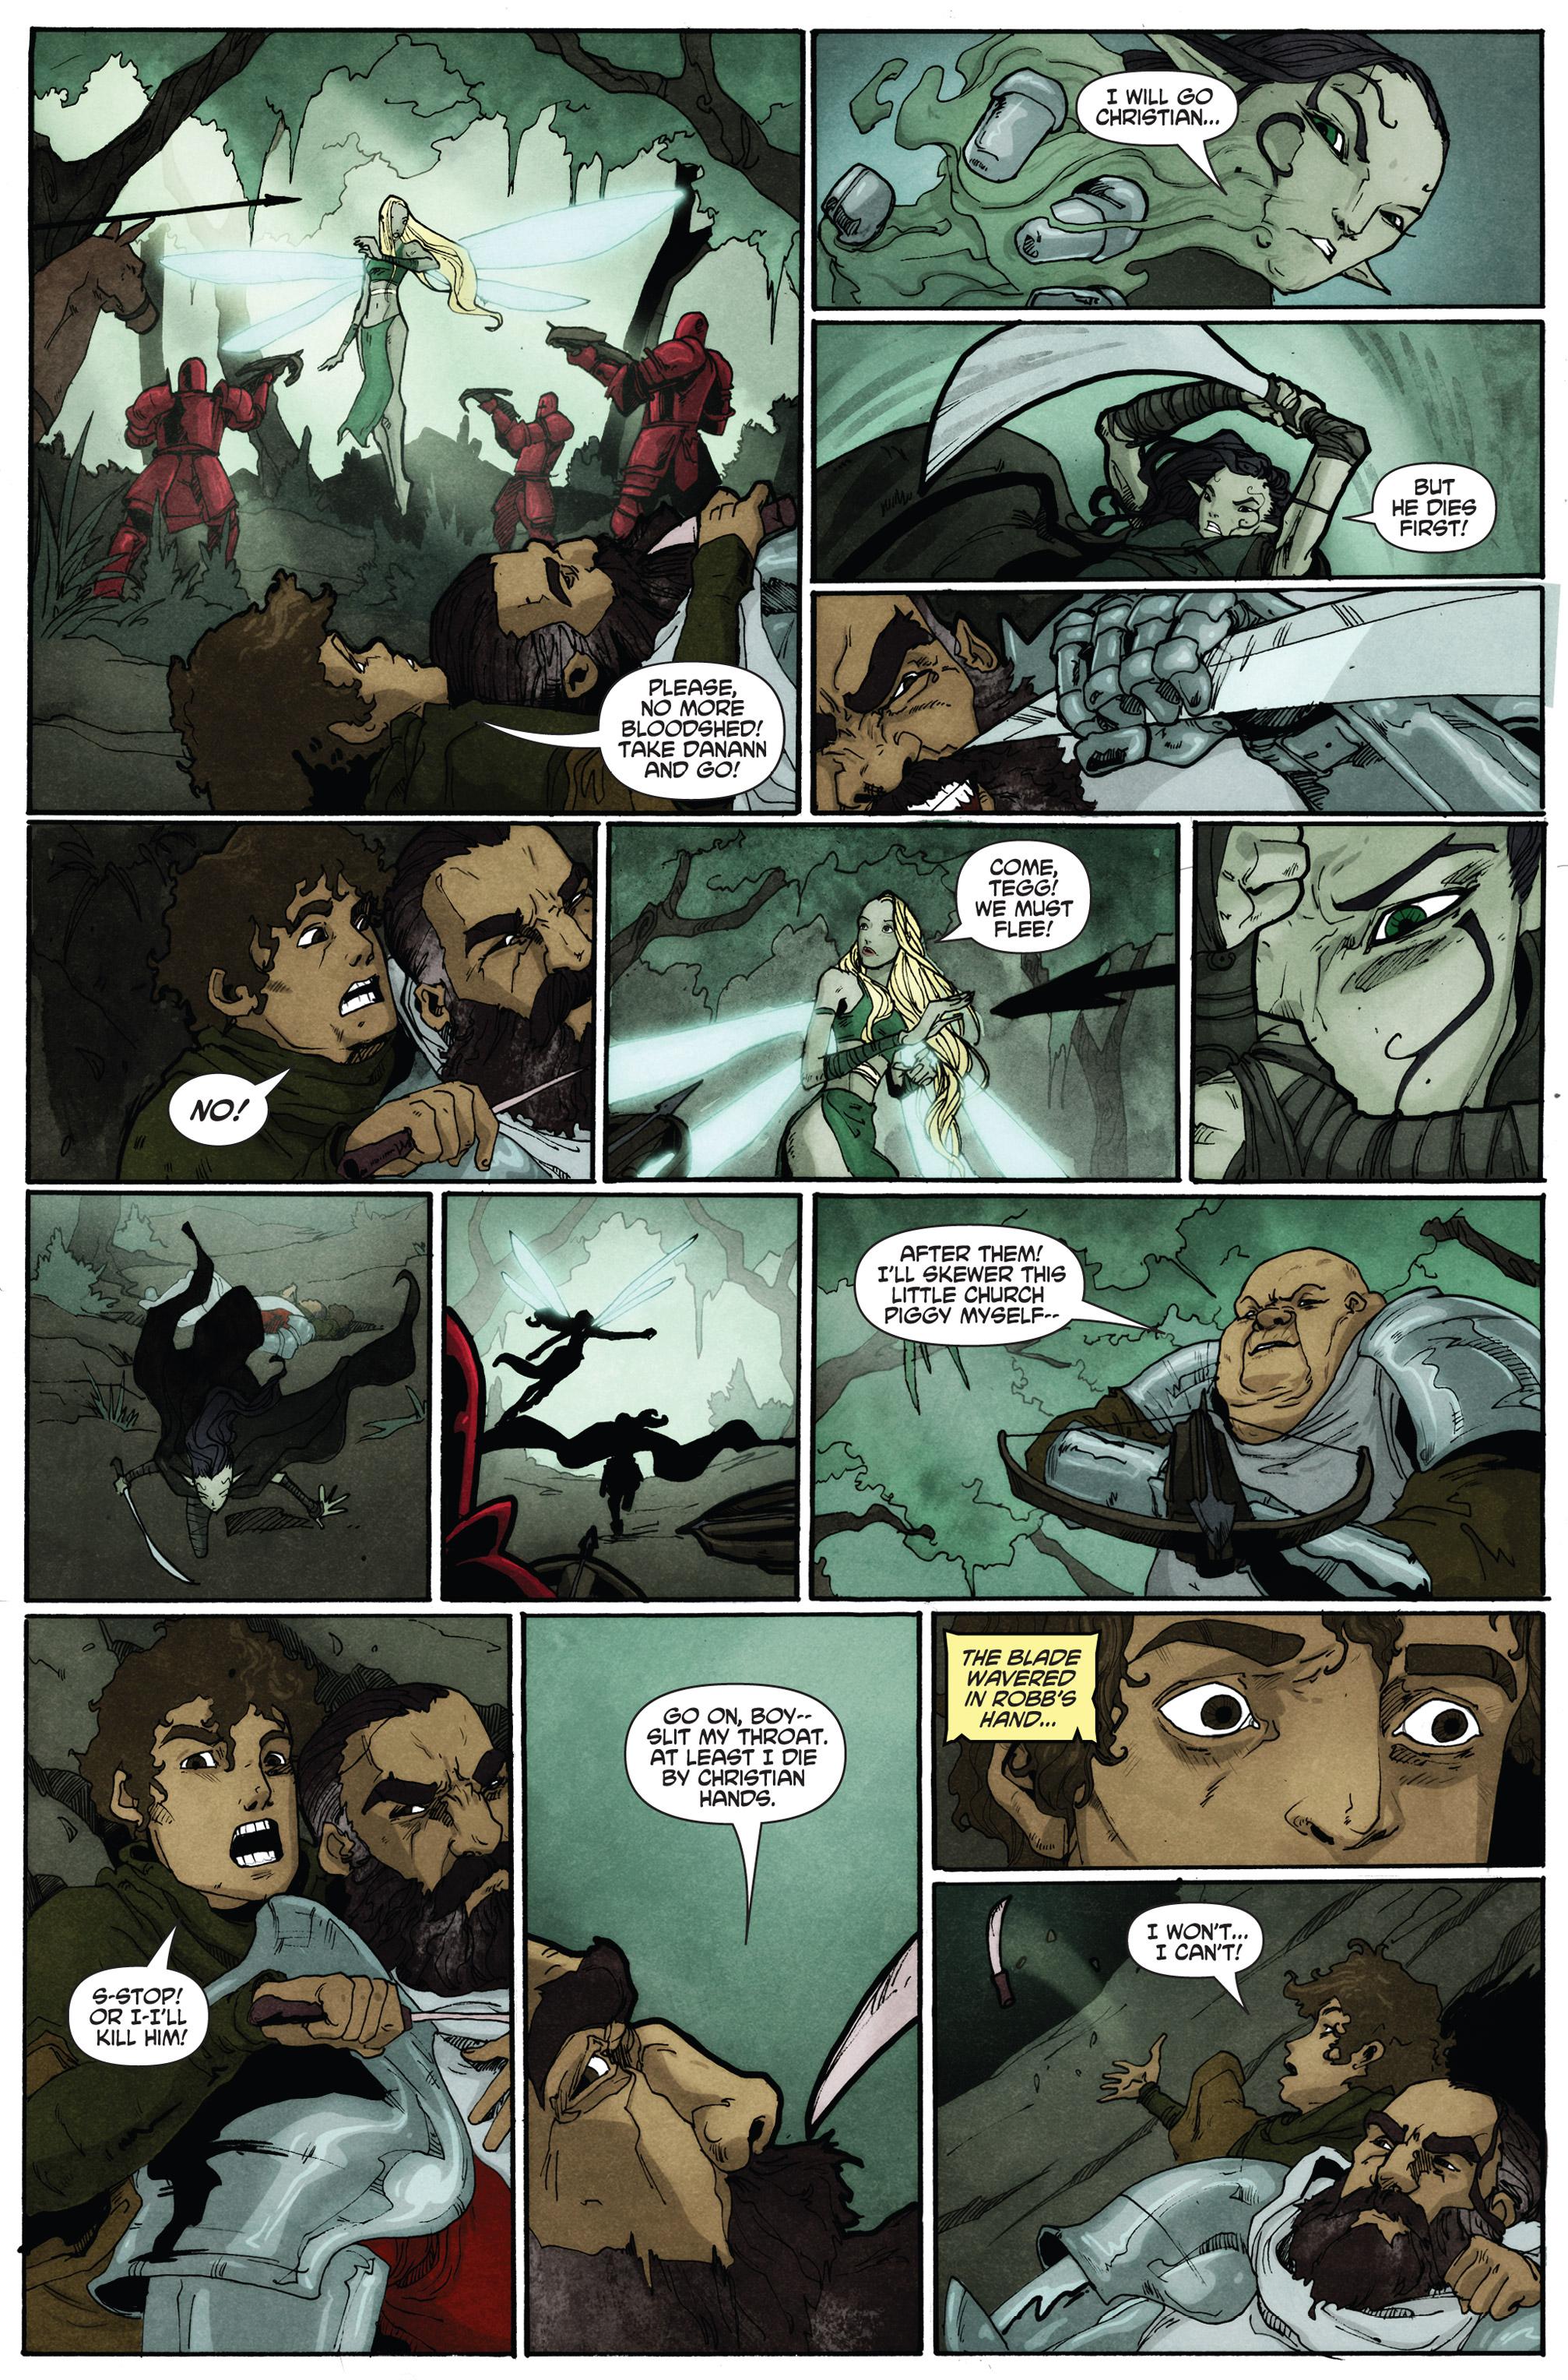 Read online Plague comic -  Issue #2 - 18